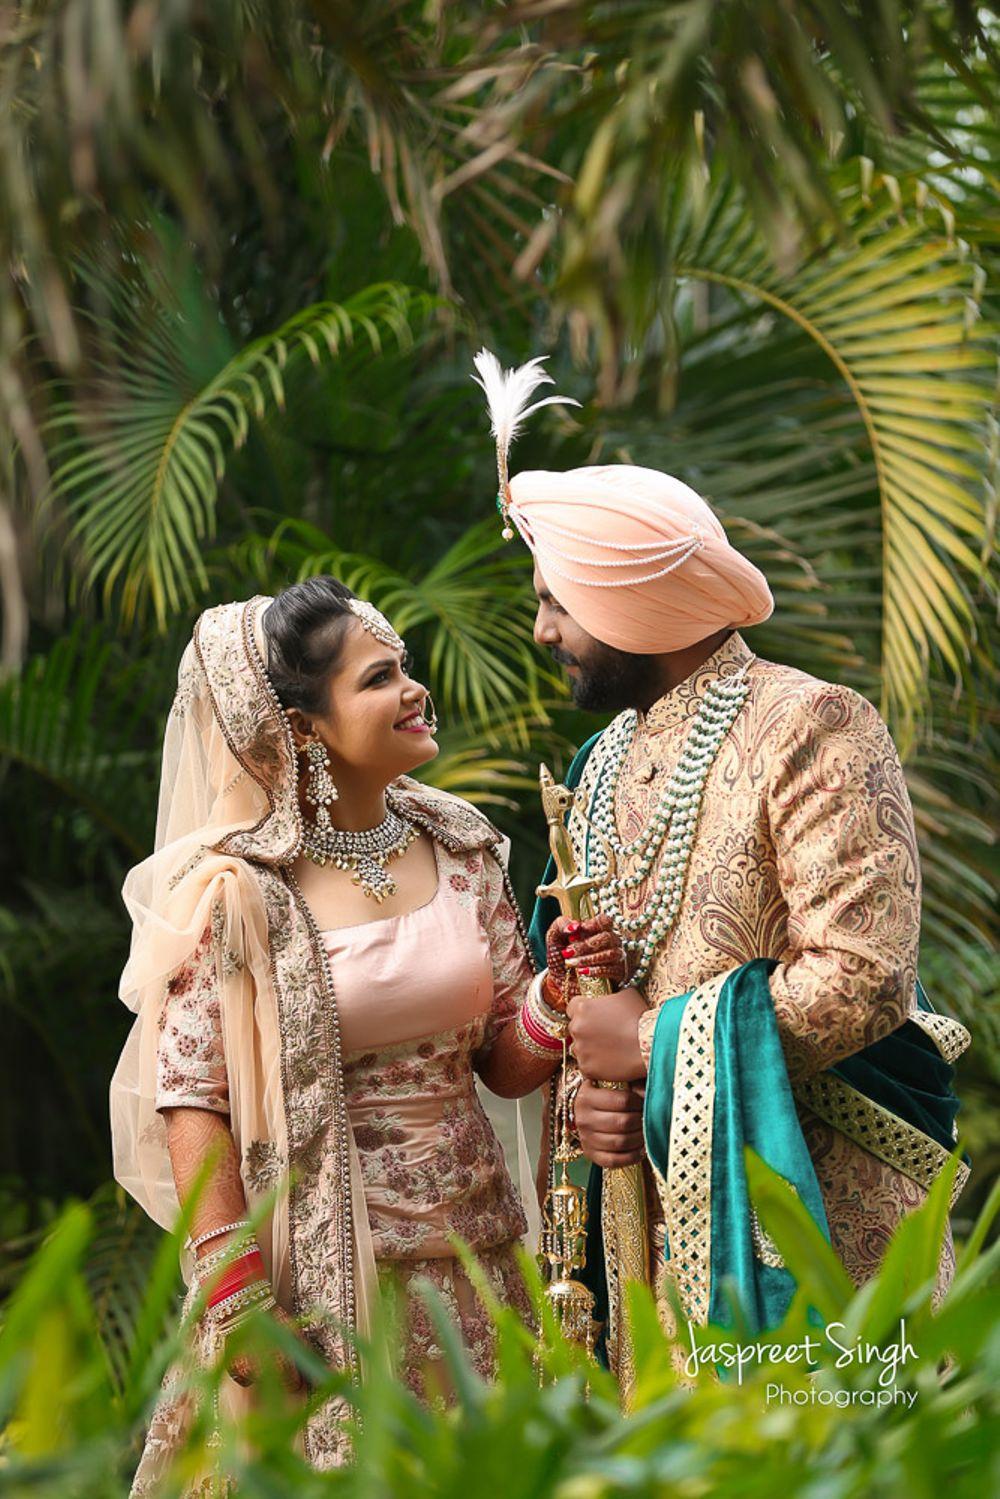 Jaspreet  Singh photo